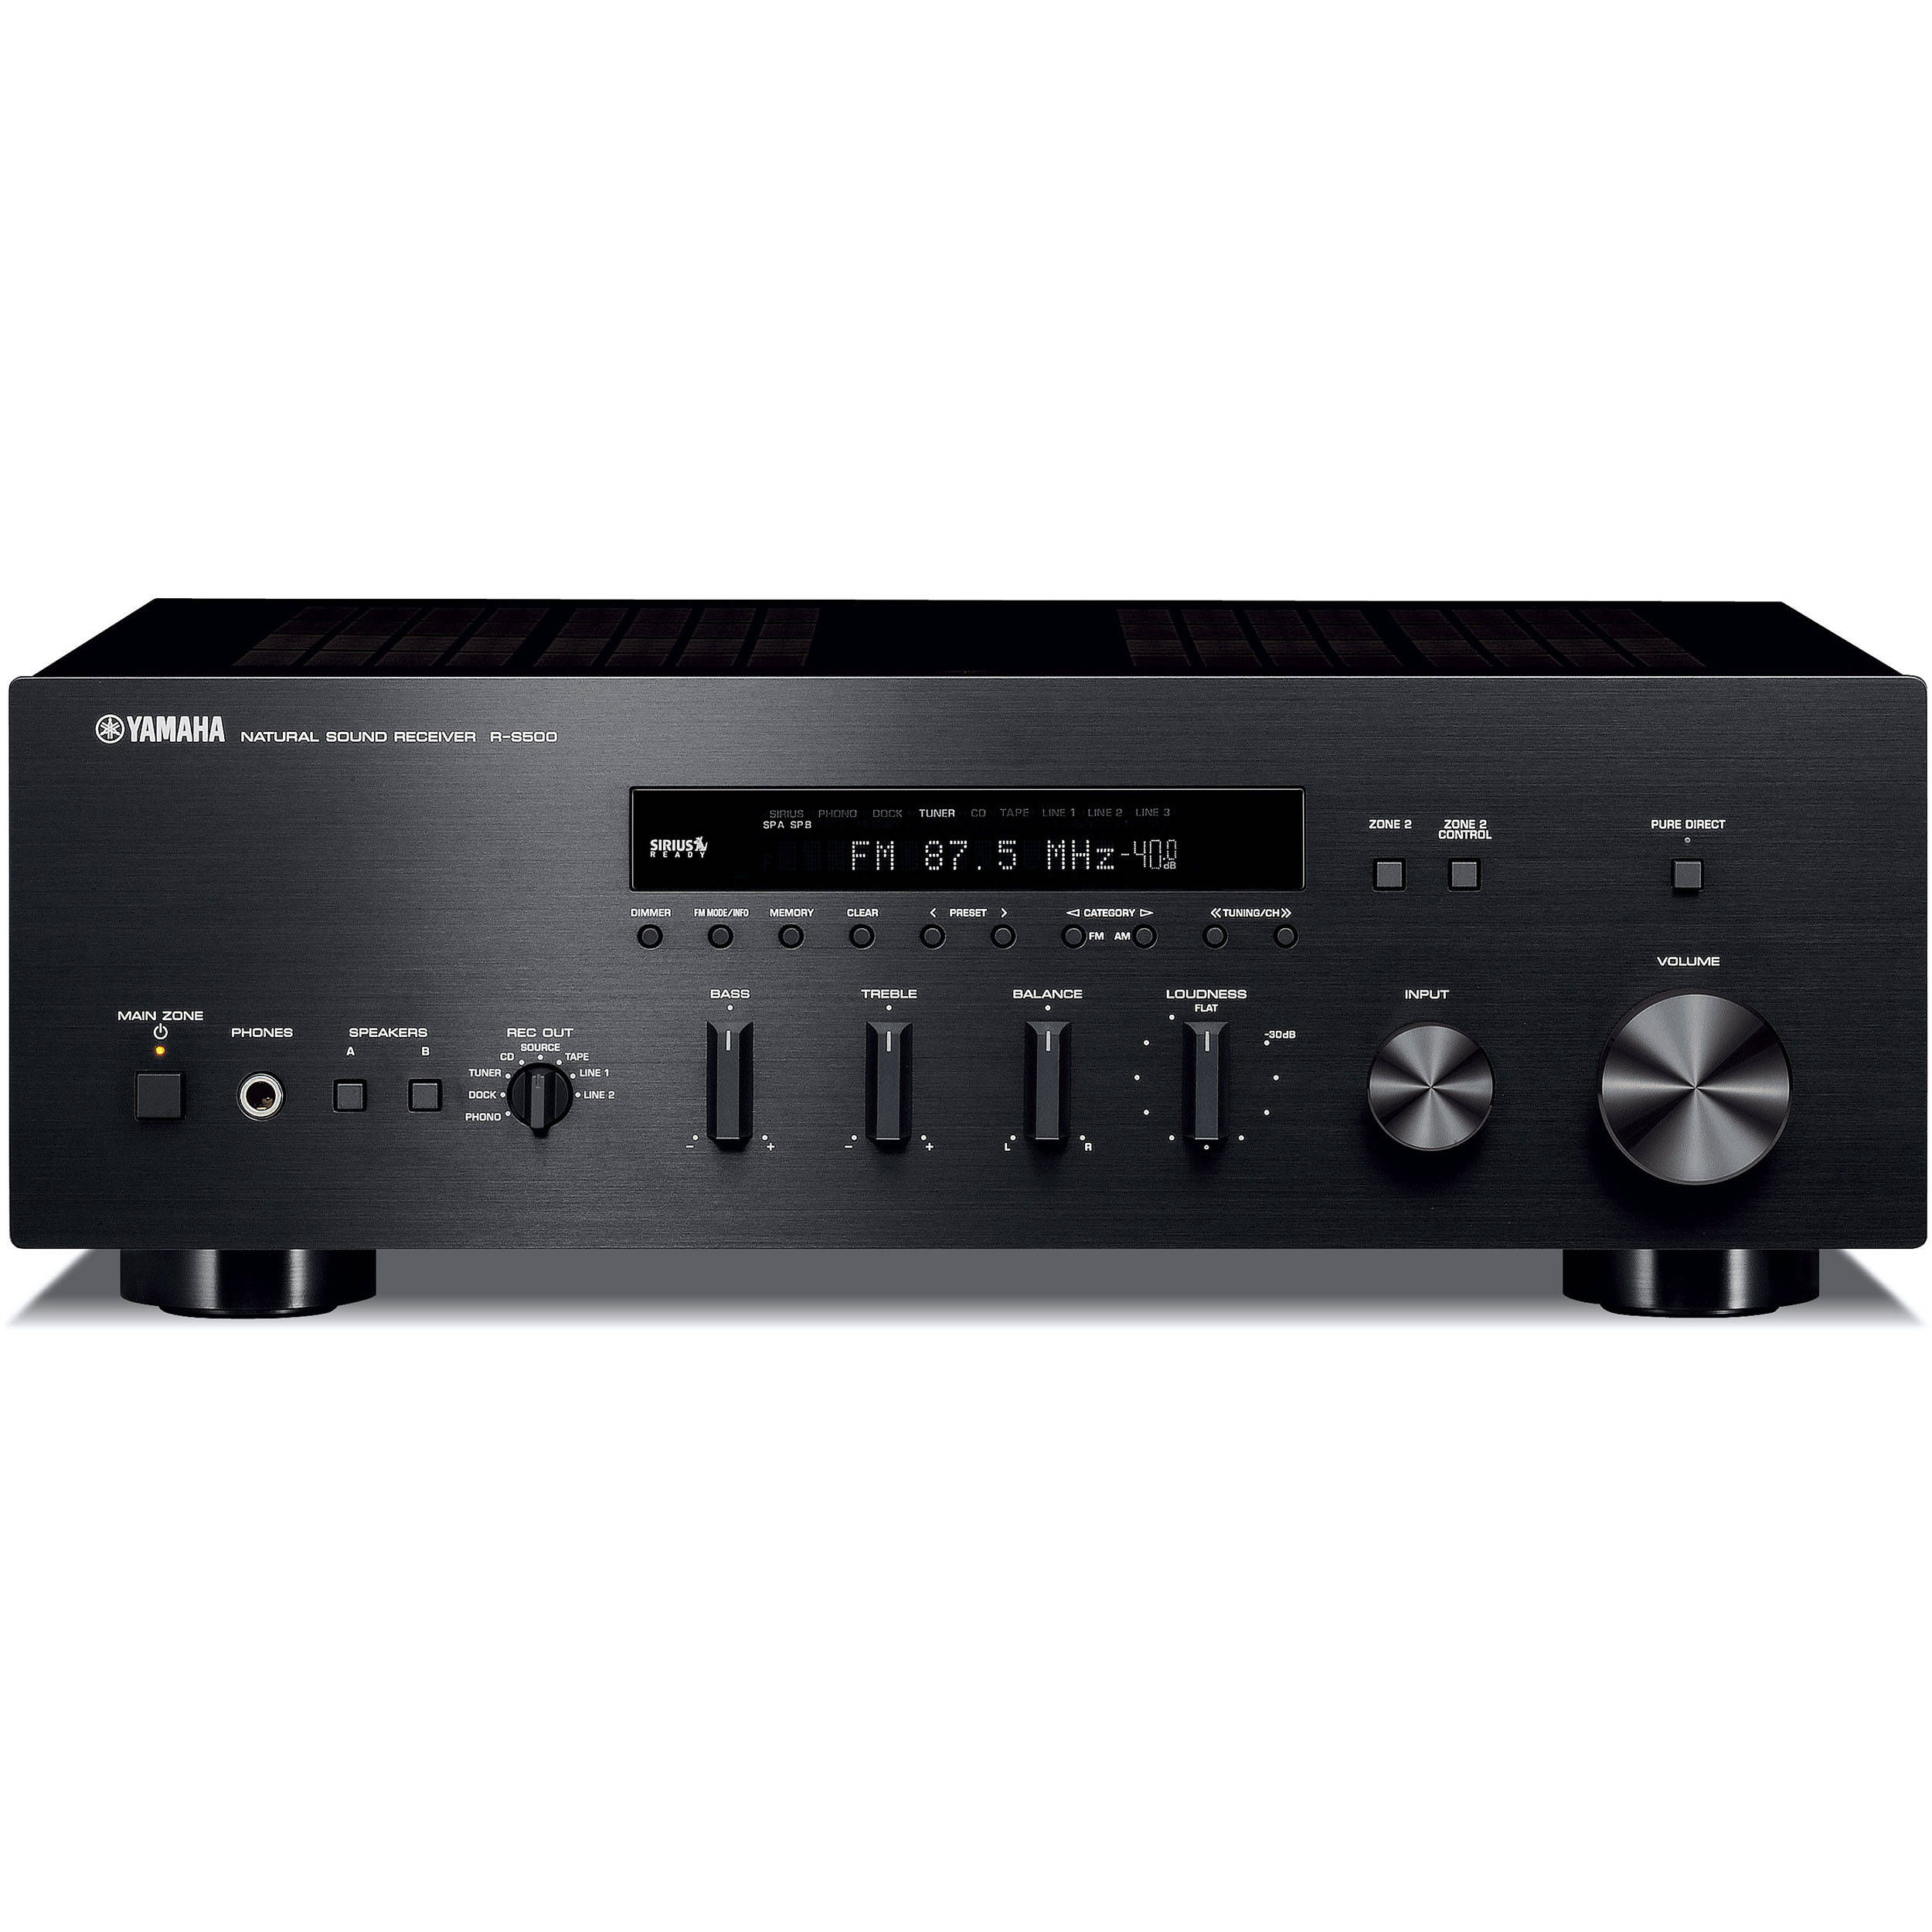 yamaha r s500 natural sound stereo receiver r s500bl b h photo. Black Bedroom Furniture Sets. Home Design Ideas